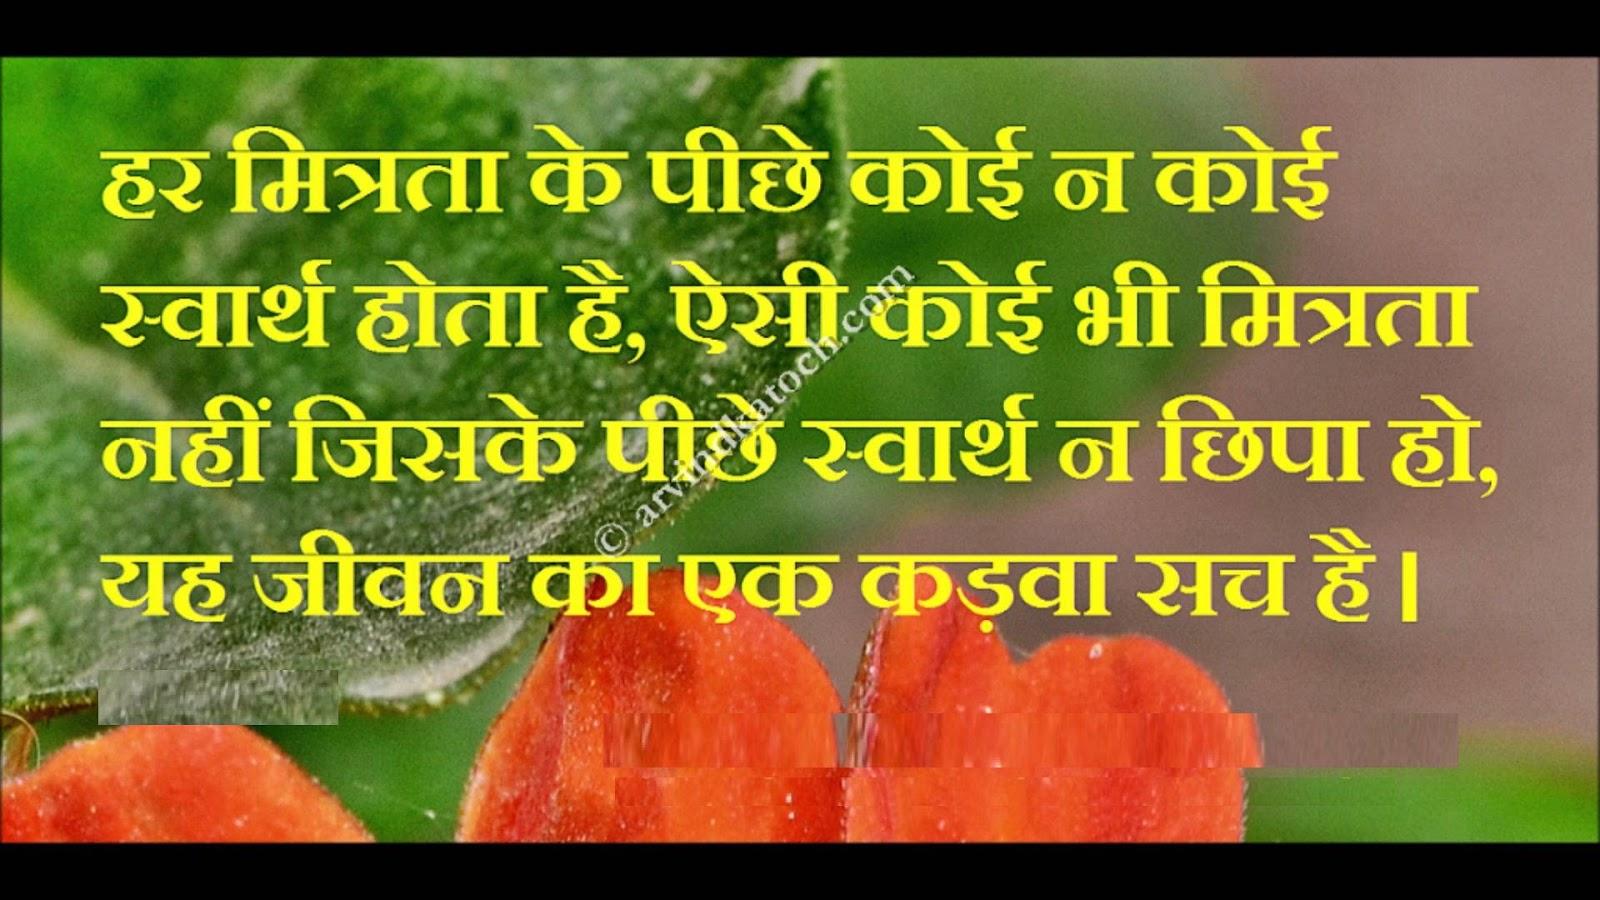 Chanakya Hindi Quotes Wallpaper Achhi Baate In Hindi Image Dard Bewafa Shayari